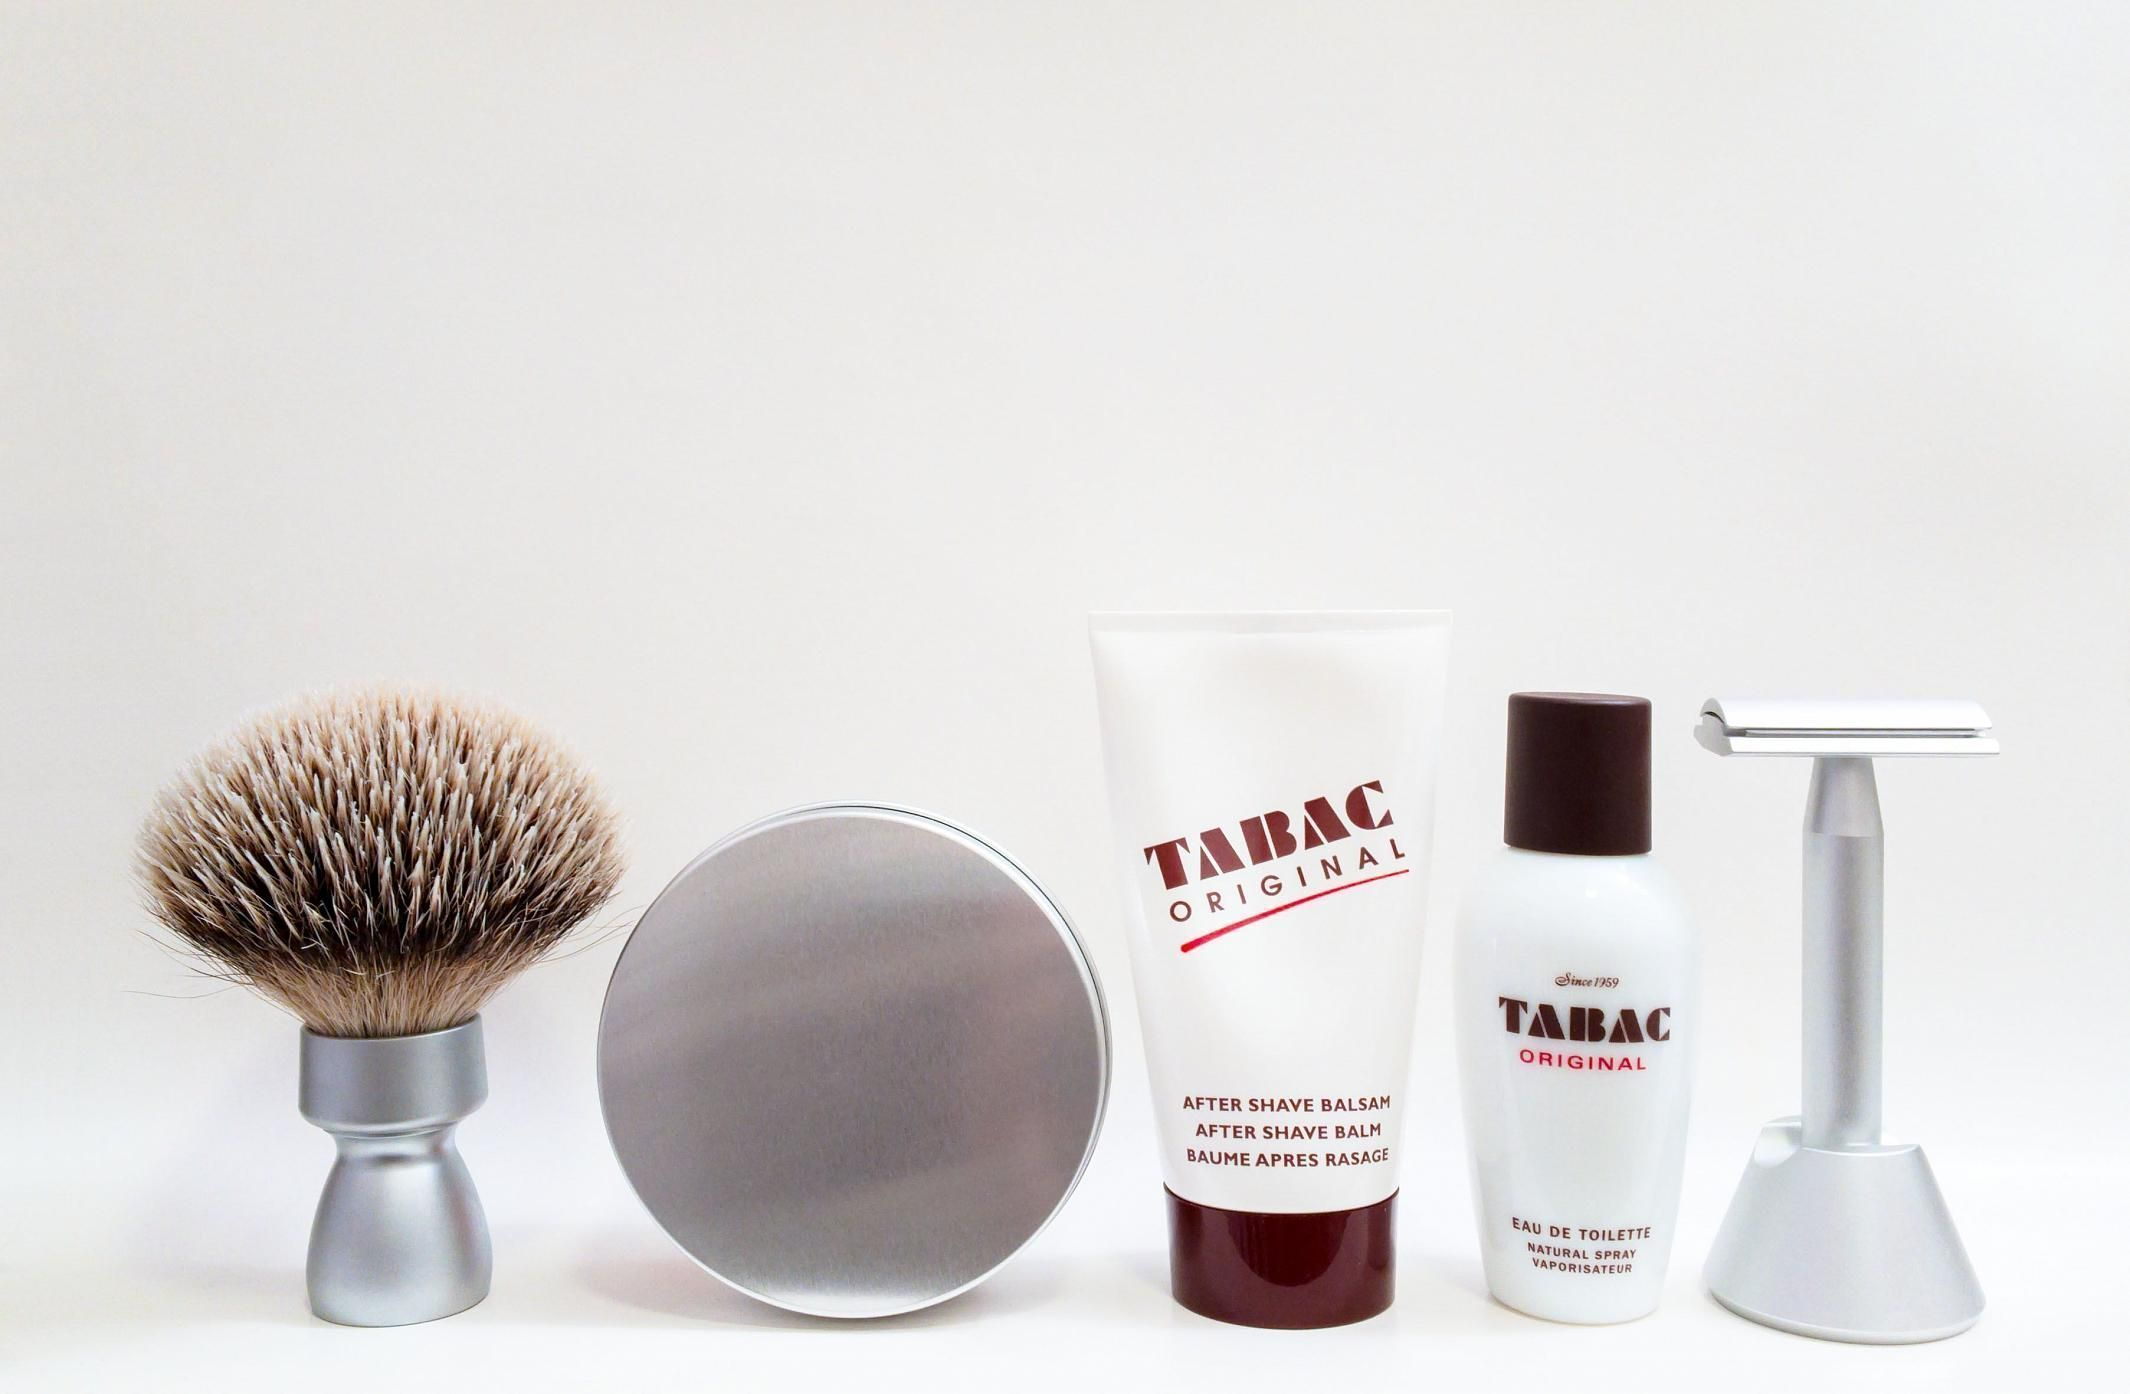 Maurer & Wirtz - Tabac (Original)